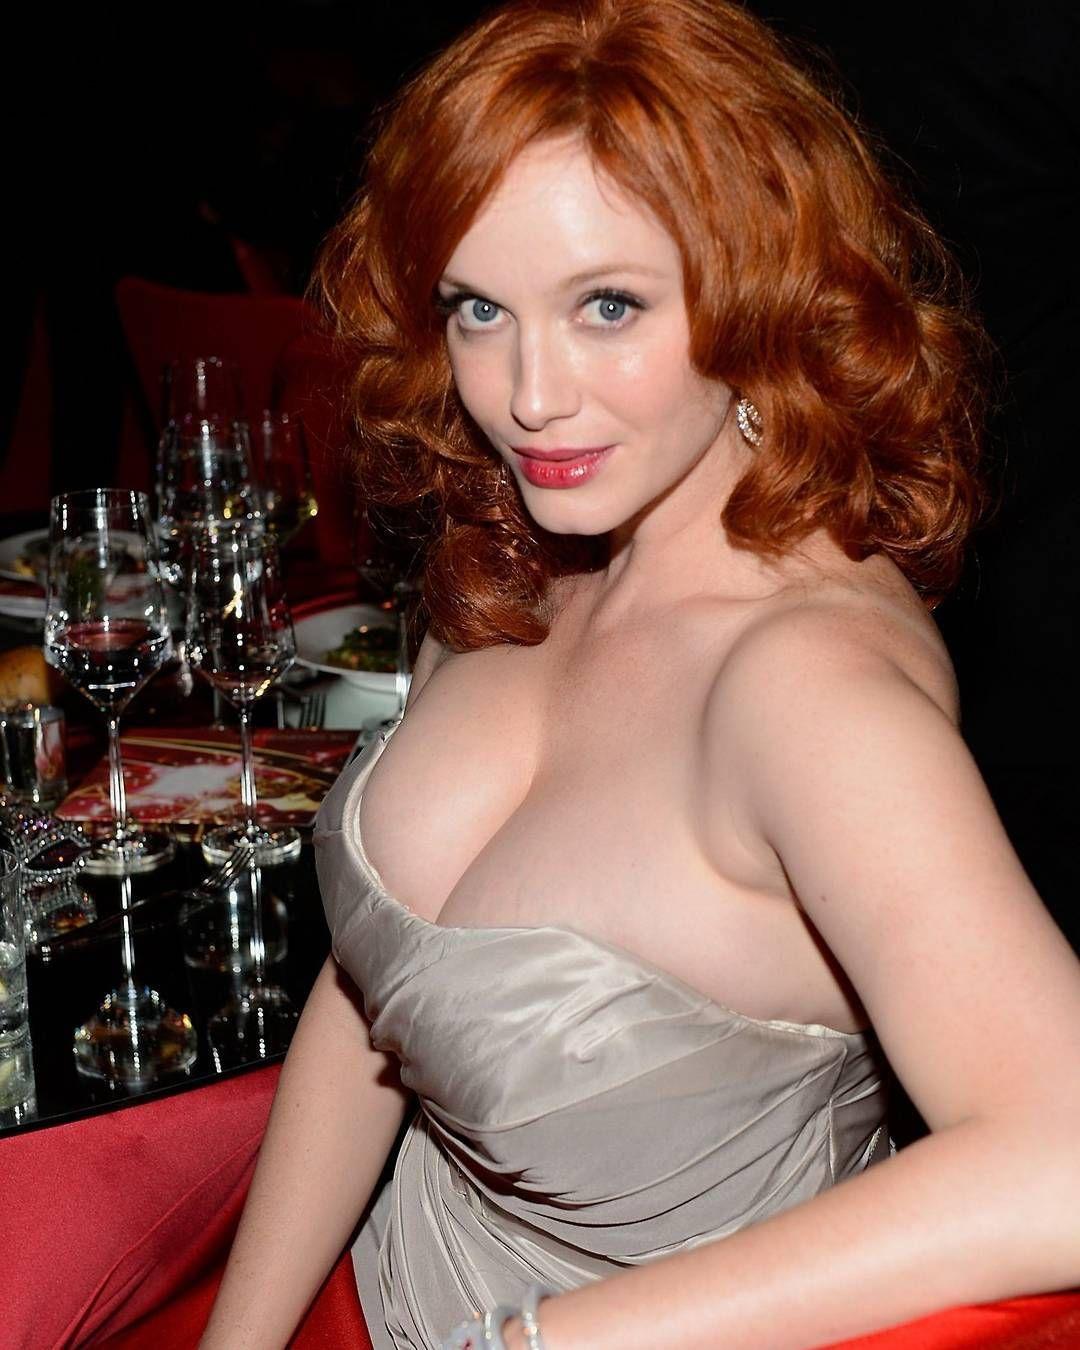 Nude Curvy Redheads